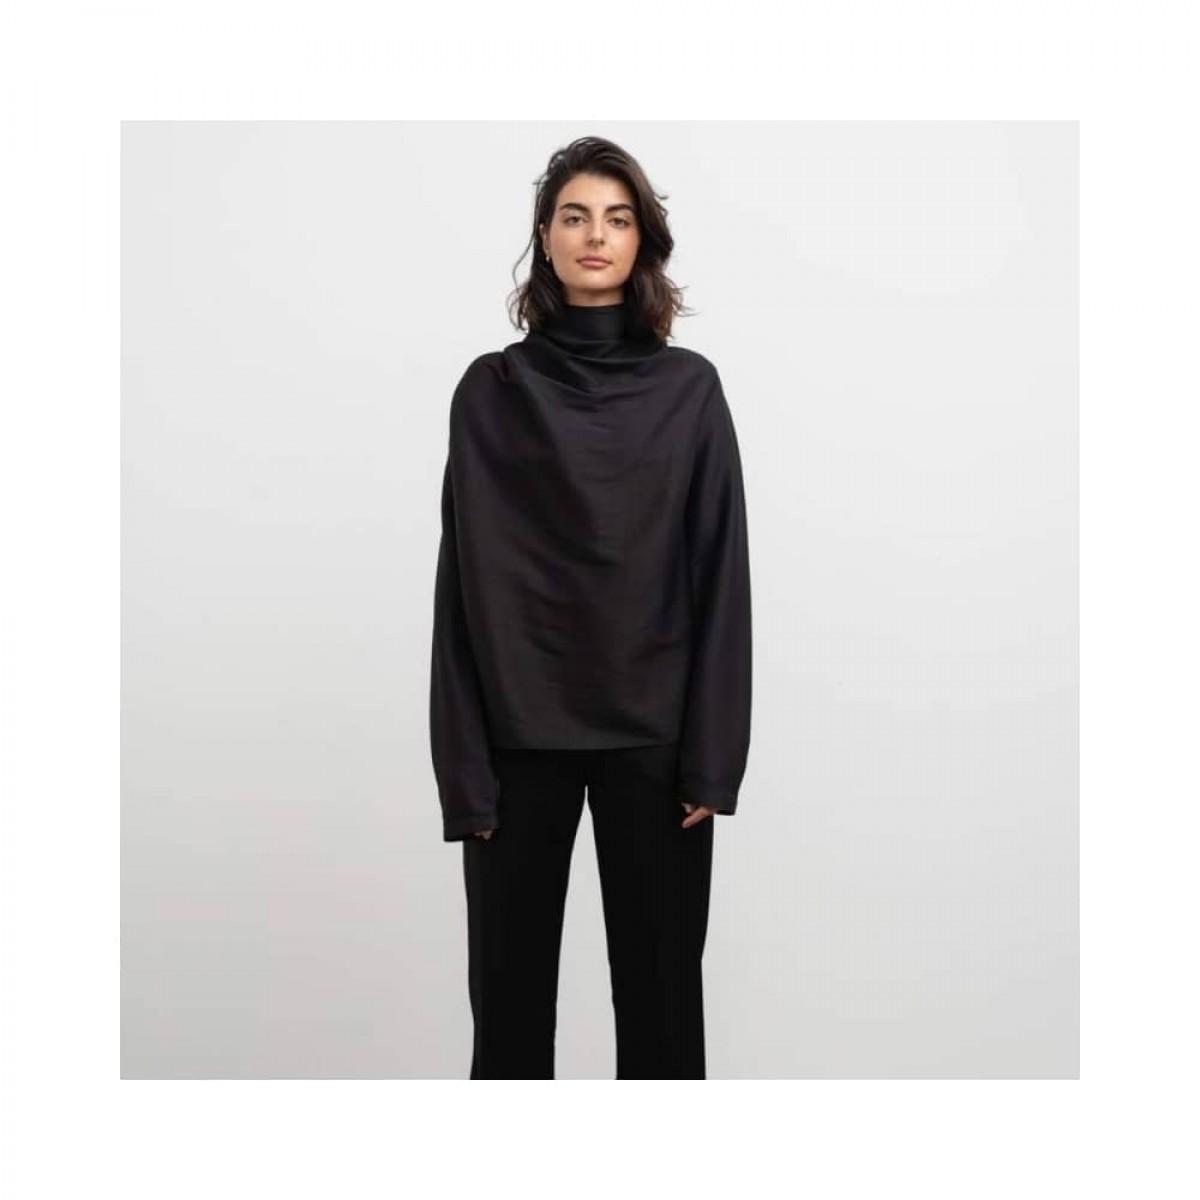 bella wool blouse - black - model front